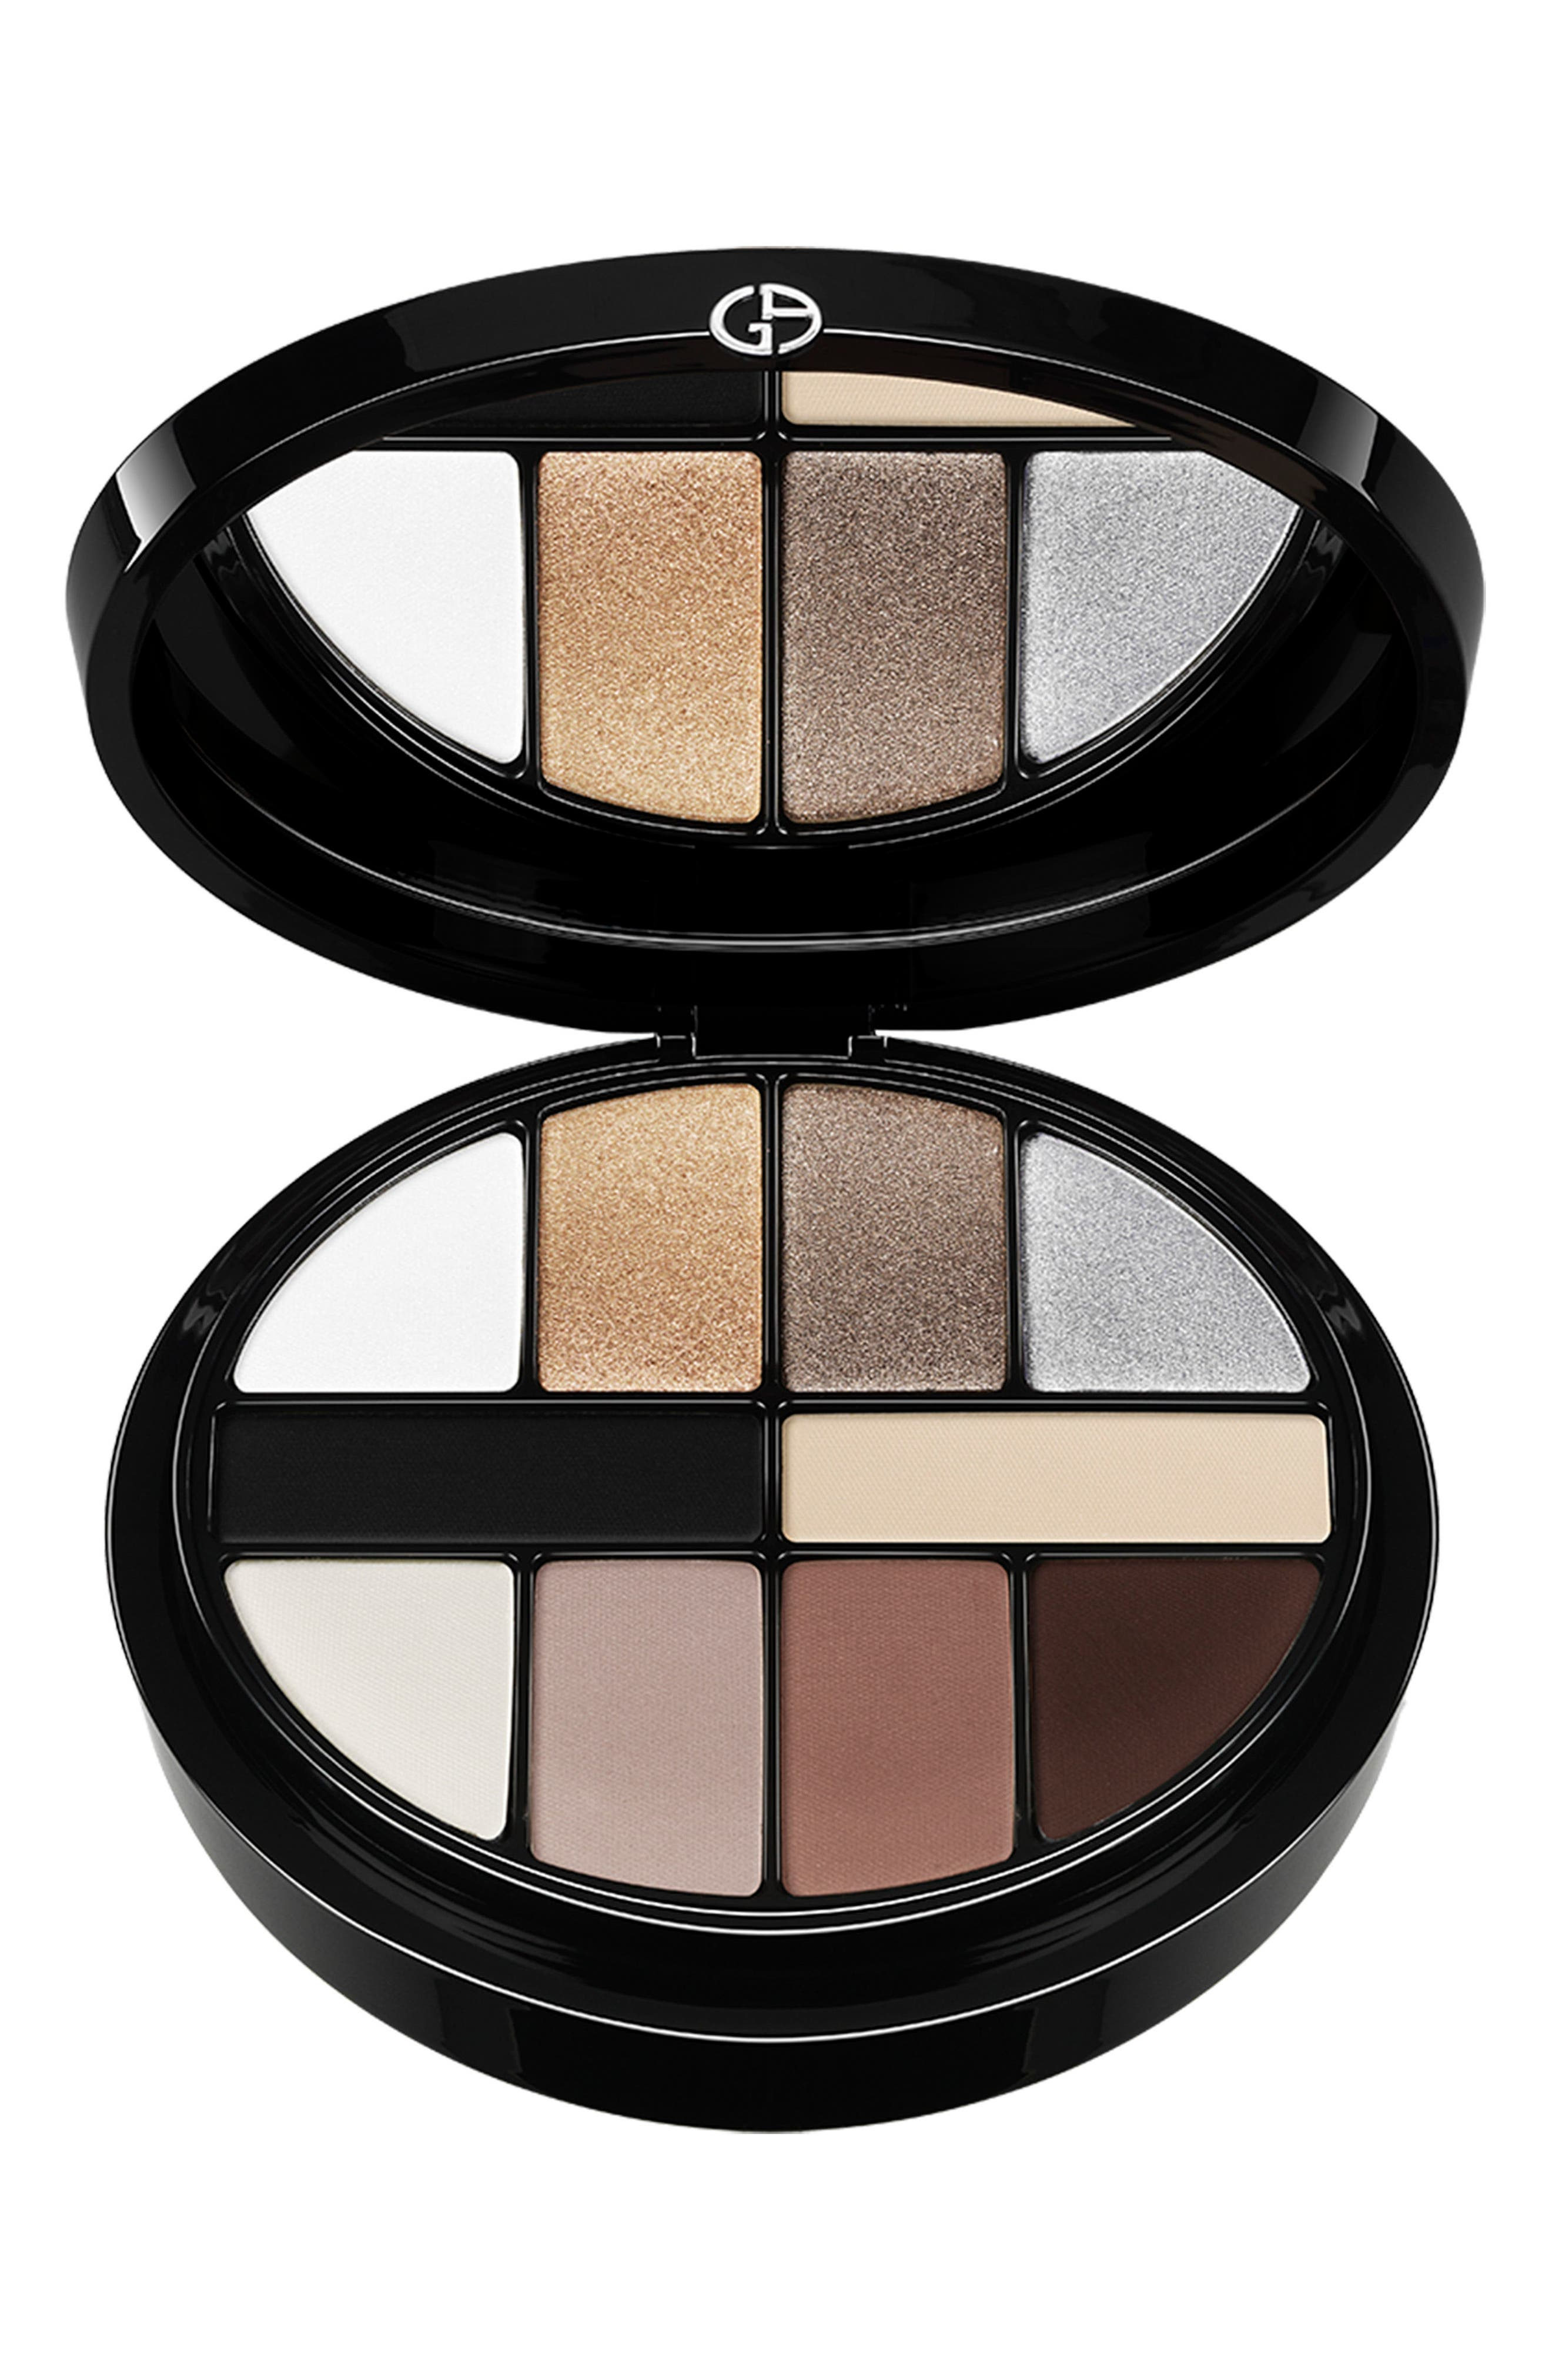 Main Image - Giorgio Armani La Mia Milano Eye and Face Makeup (Nordstrom Exclusive)